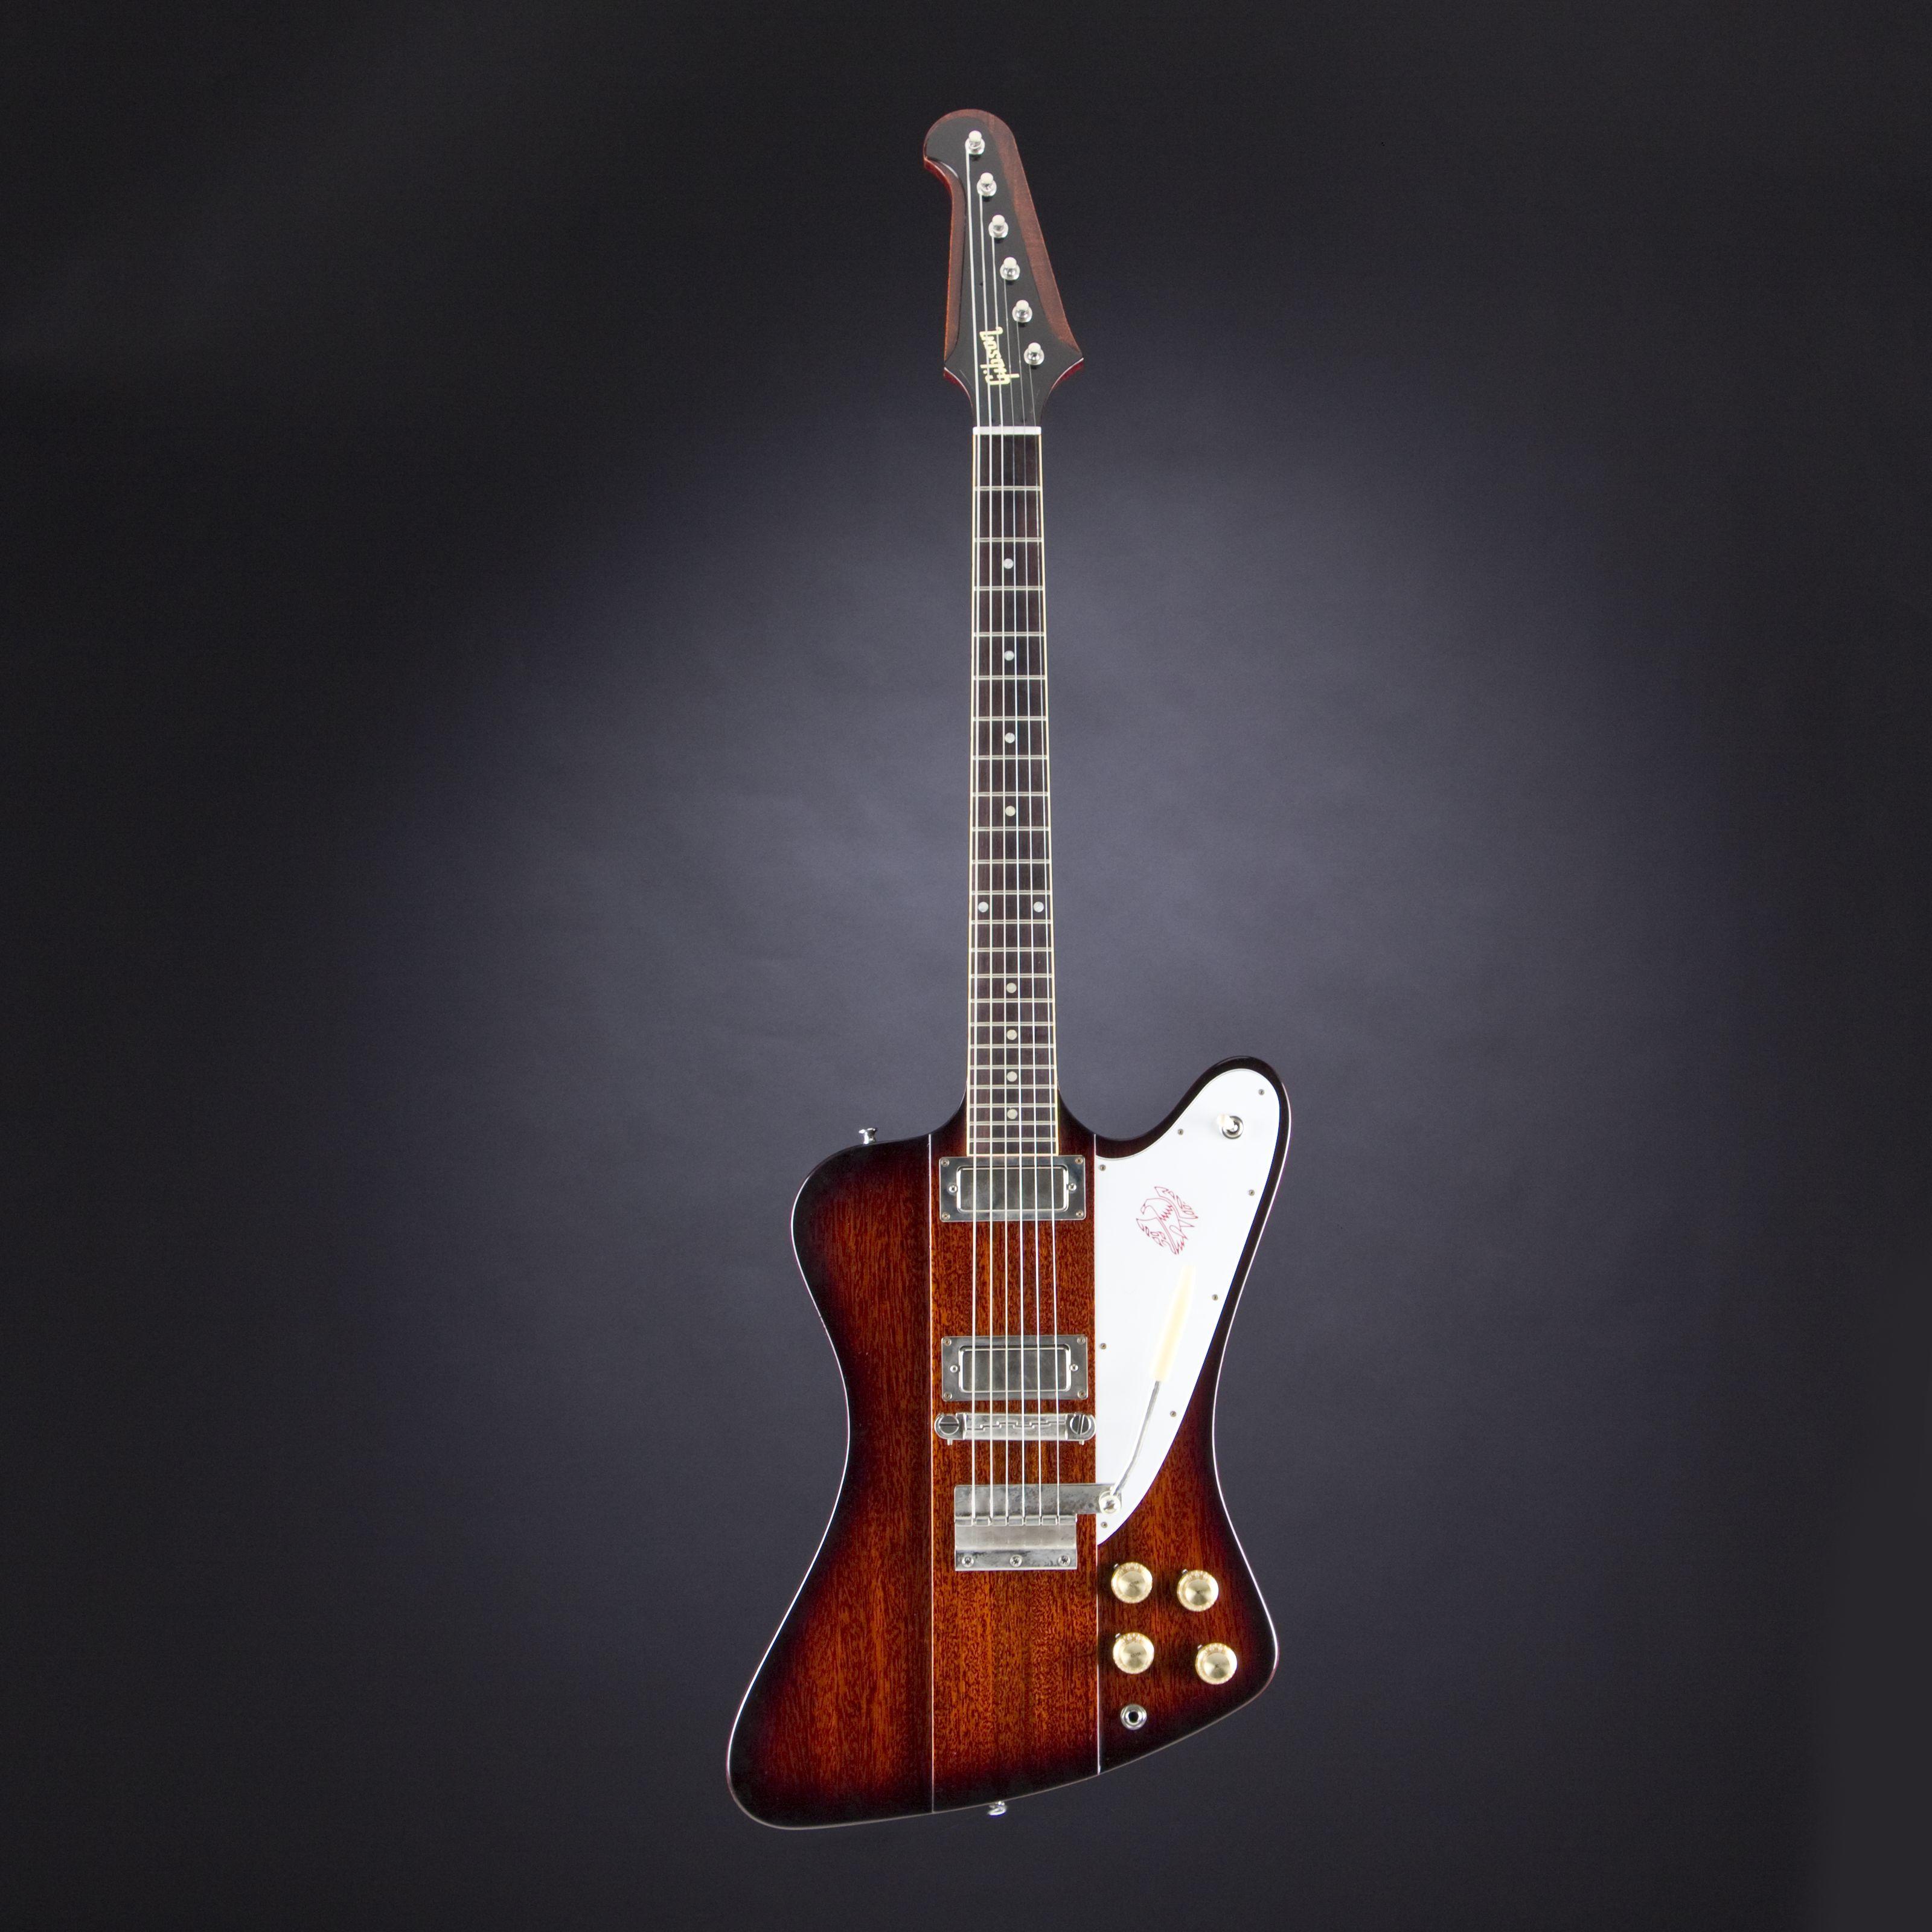 gibson firebird iii 1964 vsb preisvergleich e gitarre g nstig kaufen bei. Black Bedroom Furniture Sets. Home Design Ideas